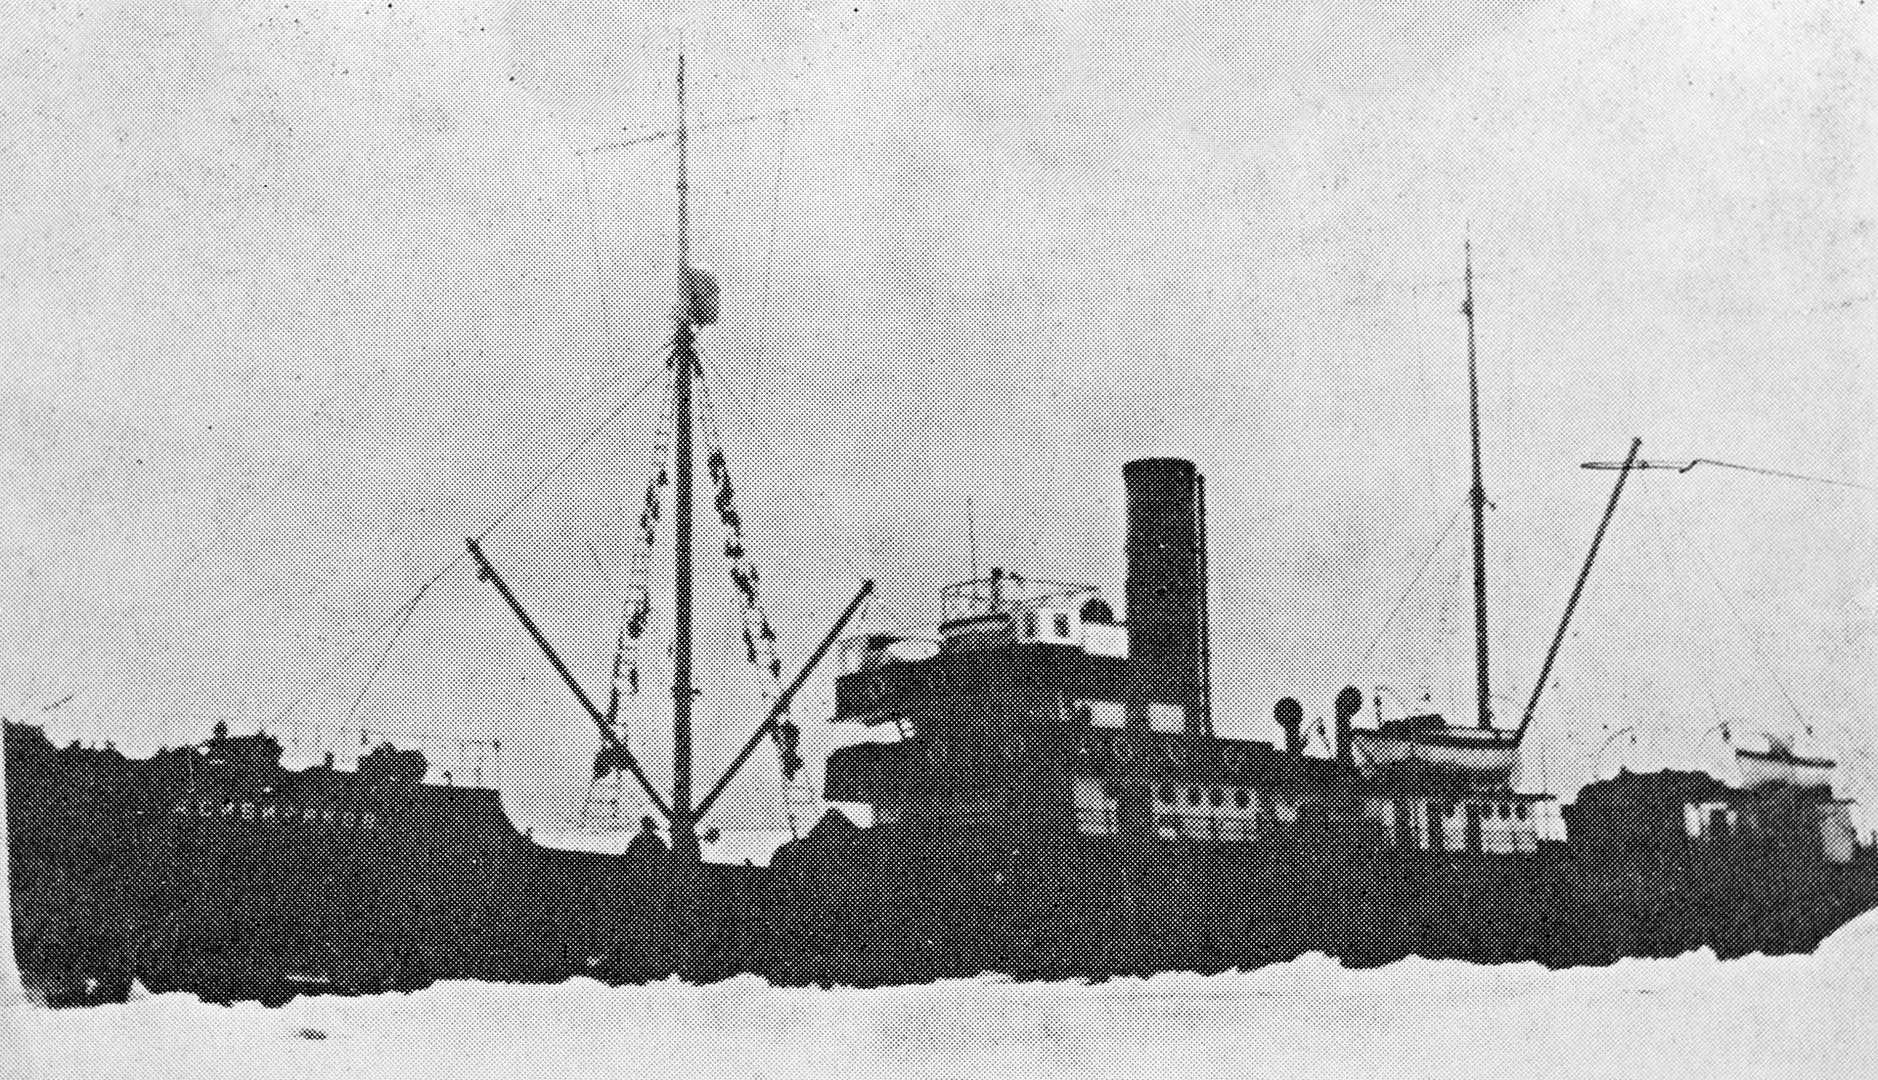 The Alexander Sibiryakov icebreaker which was named in honor of a Russian industrialist Alexander Sibiryakov [1849-1933]